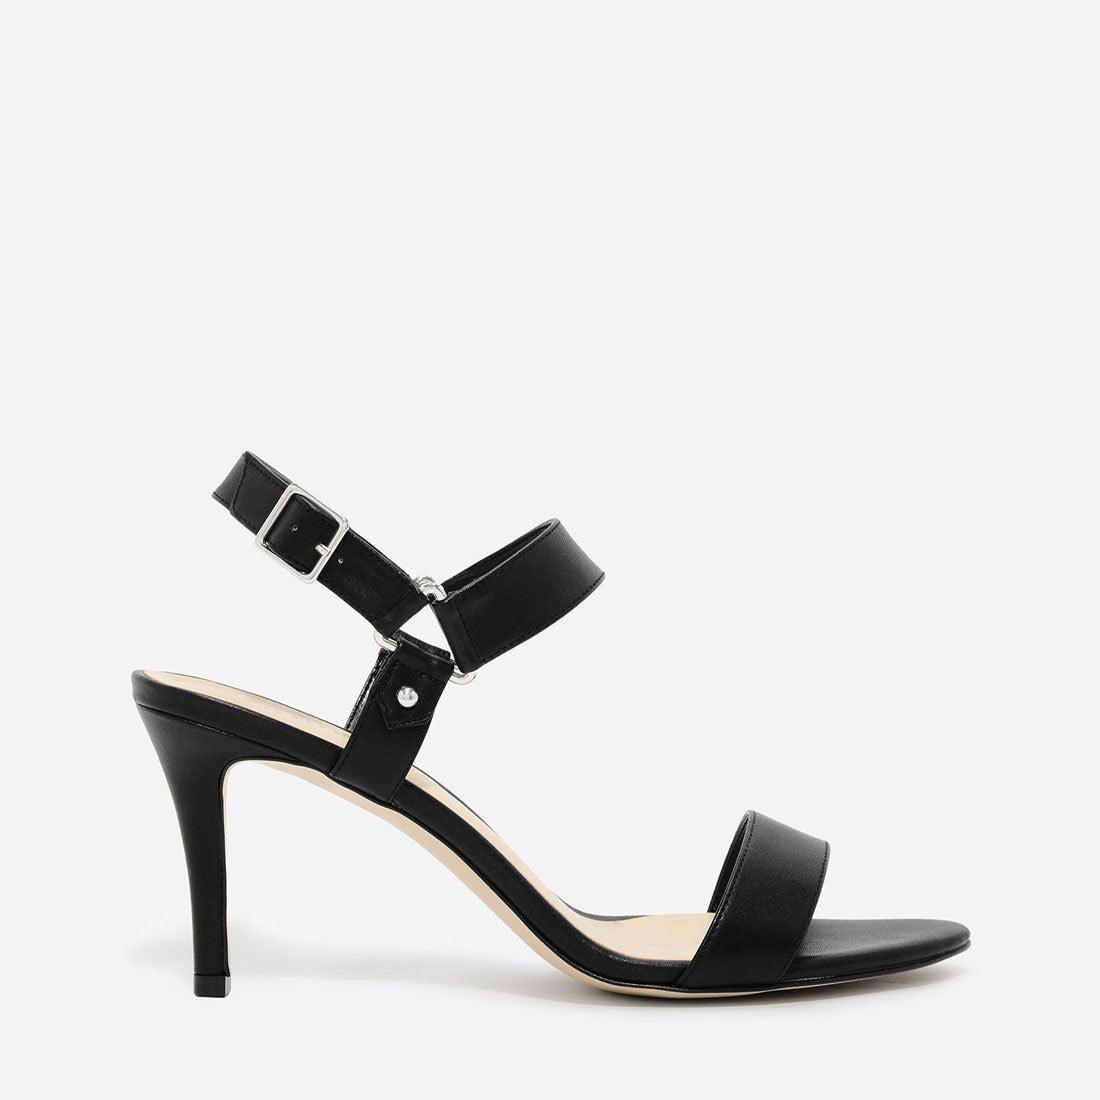 Ladies Summer Sandals Chrome Block Heels Peep Toe Womens Ankle Strap Shoes Size